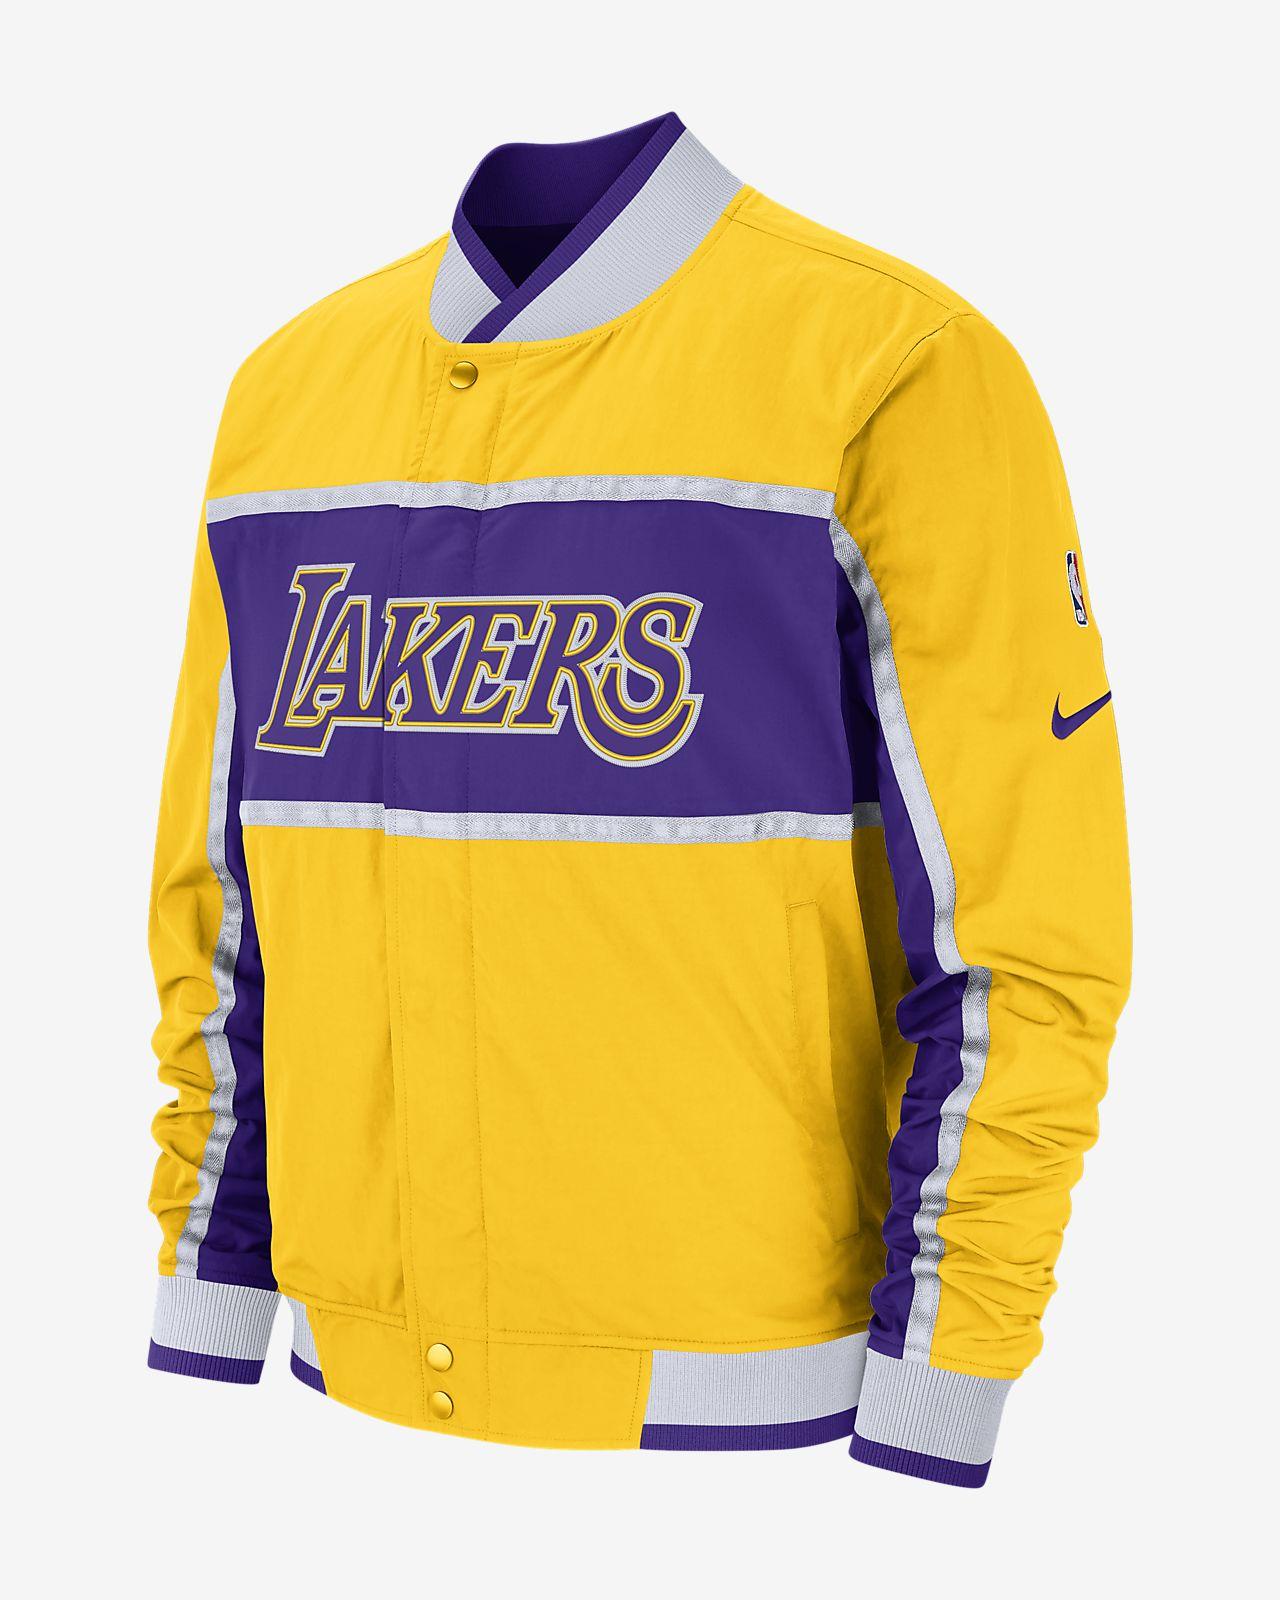 Chamarra de la NBA para hombre Los Angeles Lakers Nike Courtside